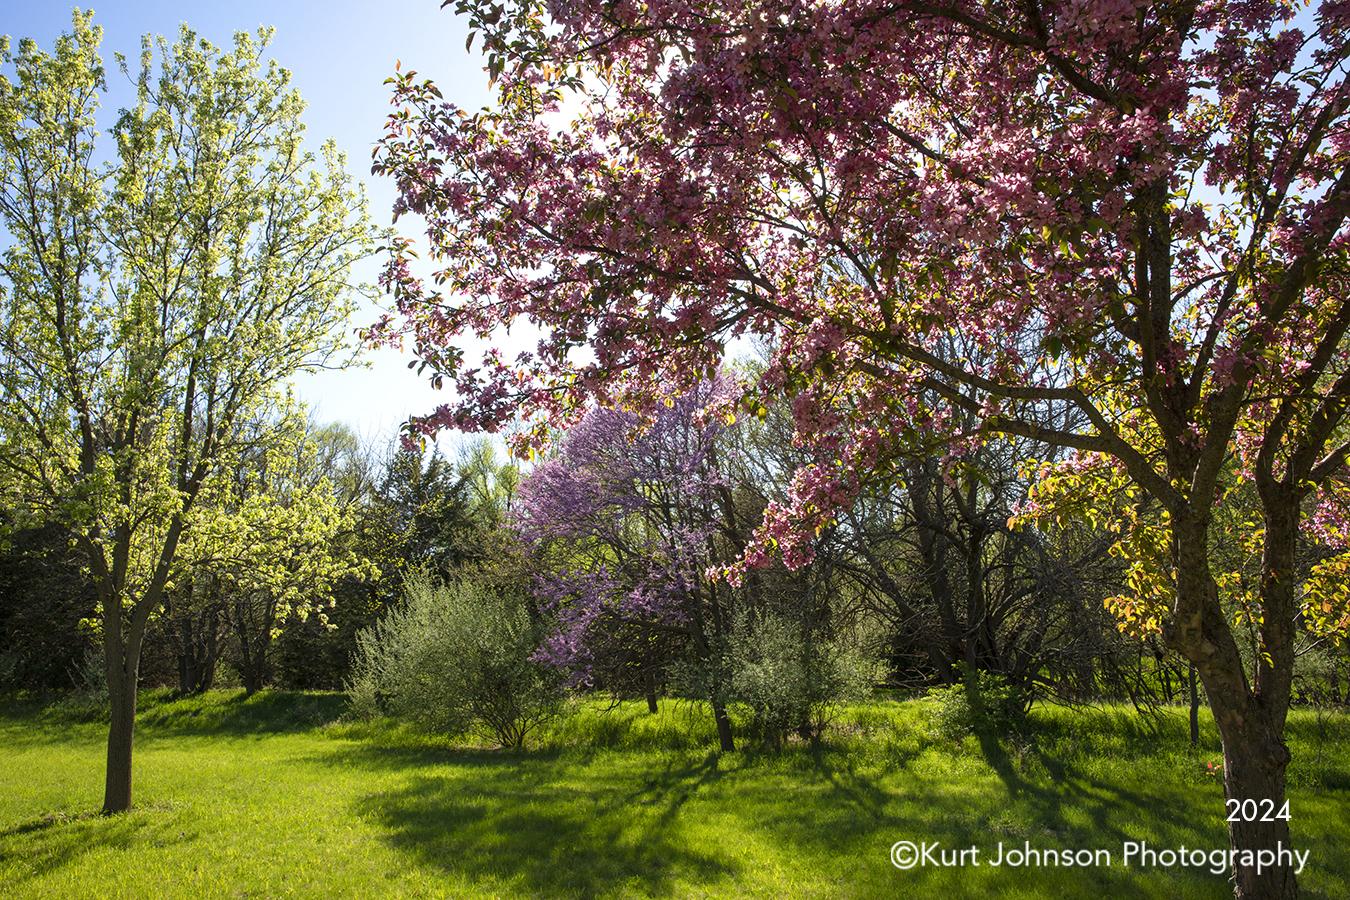 purple pink spring tree trees landscape sunlight shadows green grass